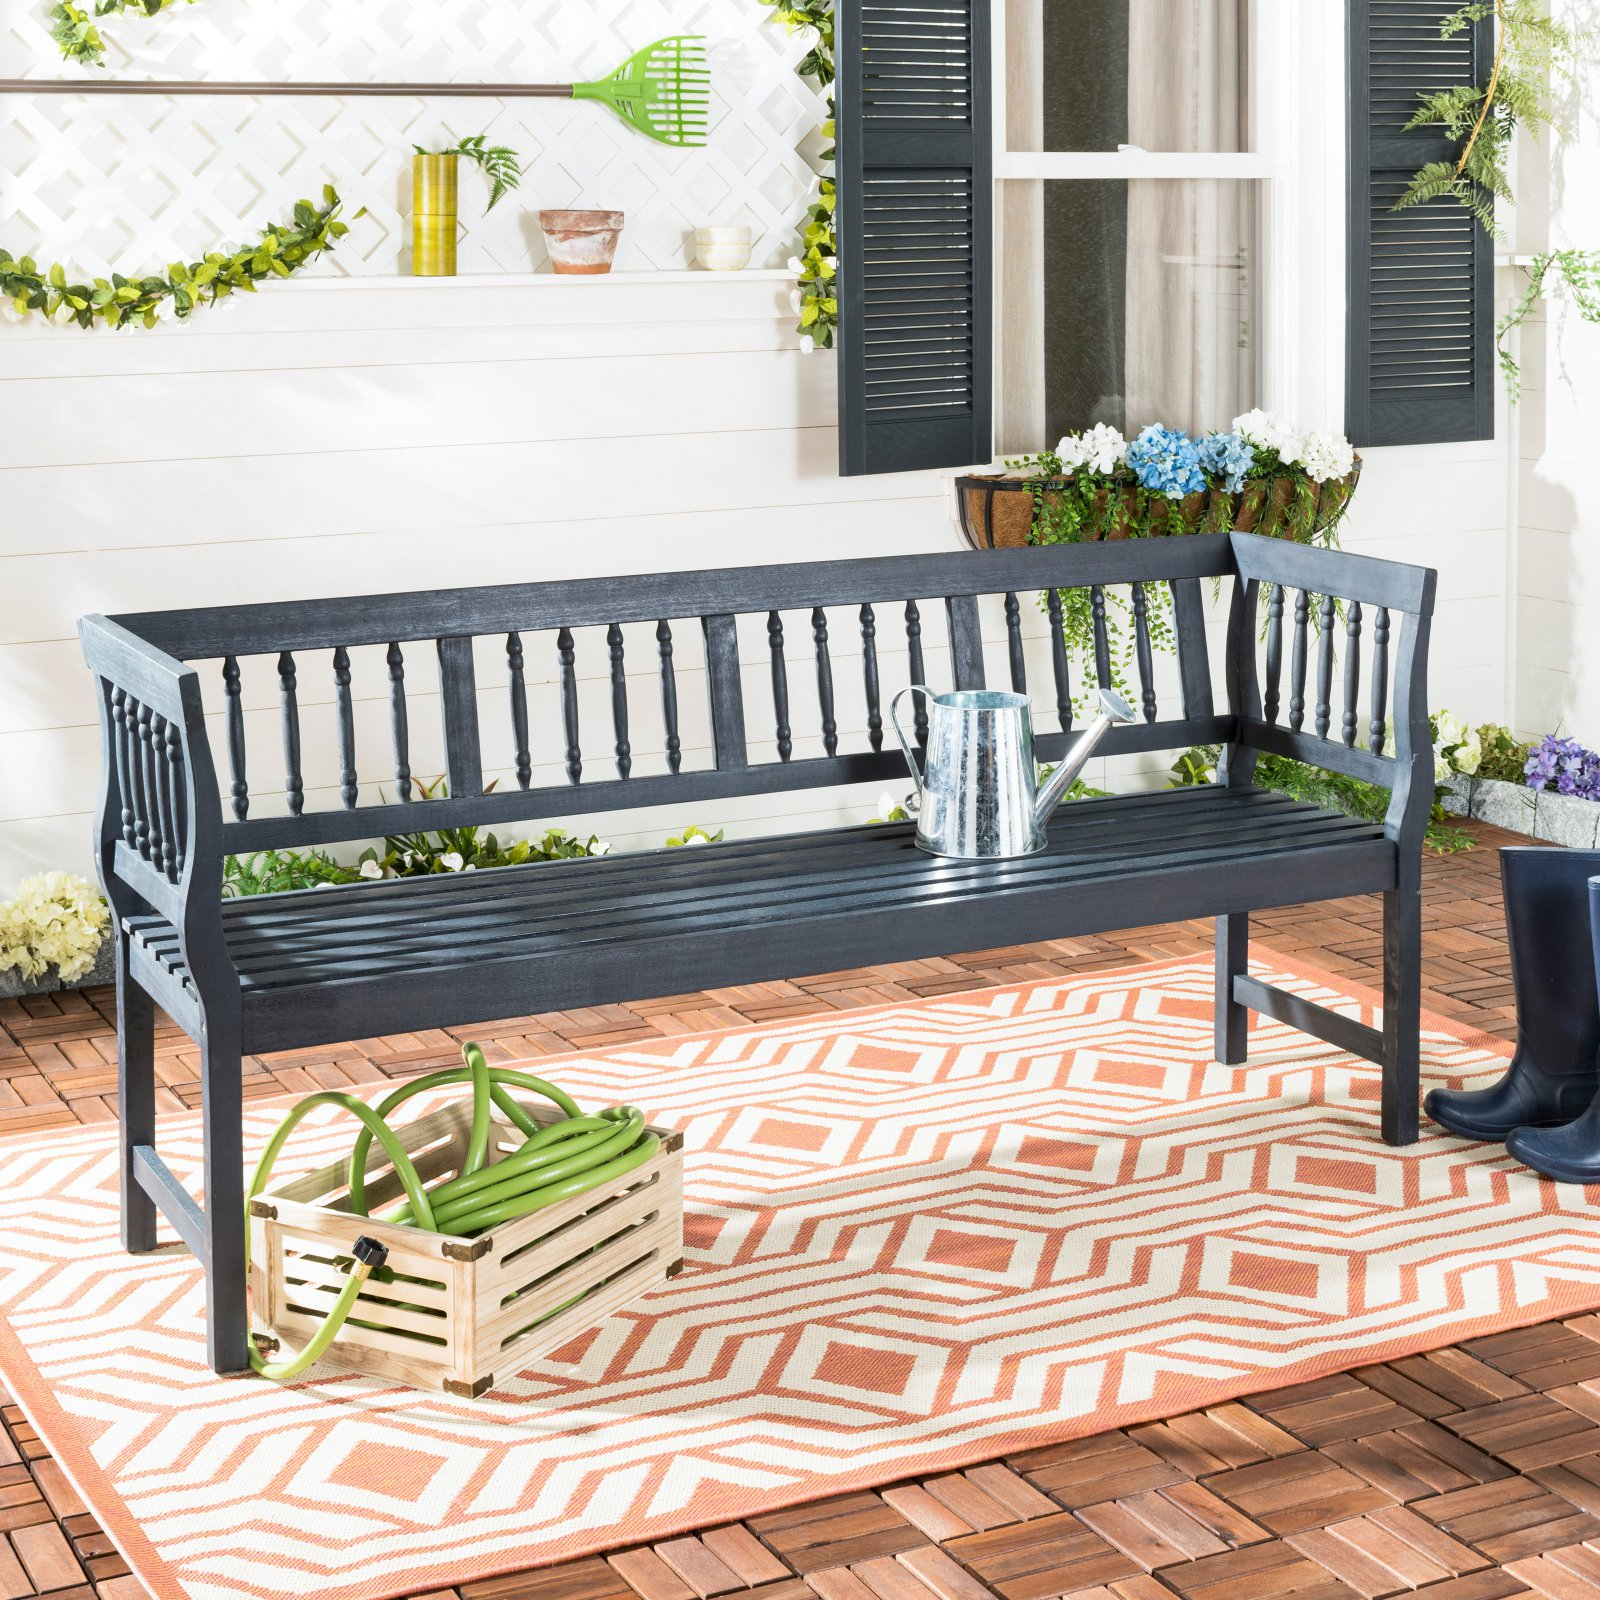 Safavieh Brentwood Indoor/Outdoor Traditional Acacia Patio Bench